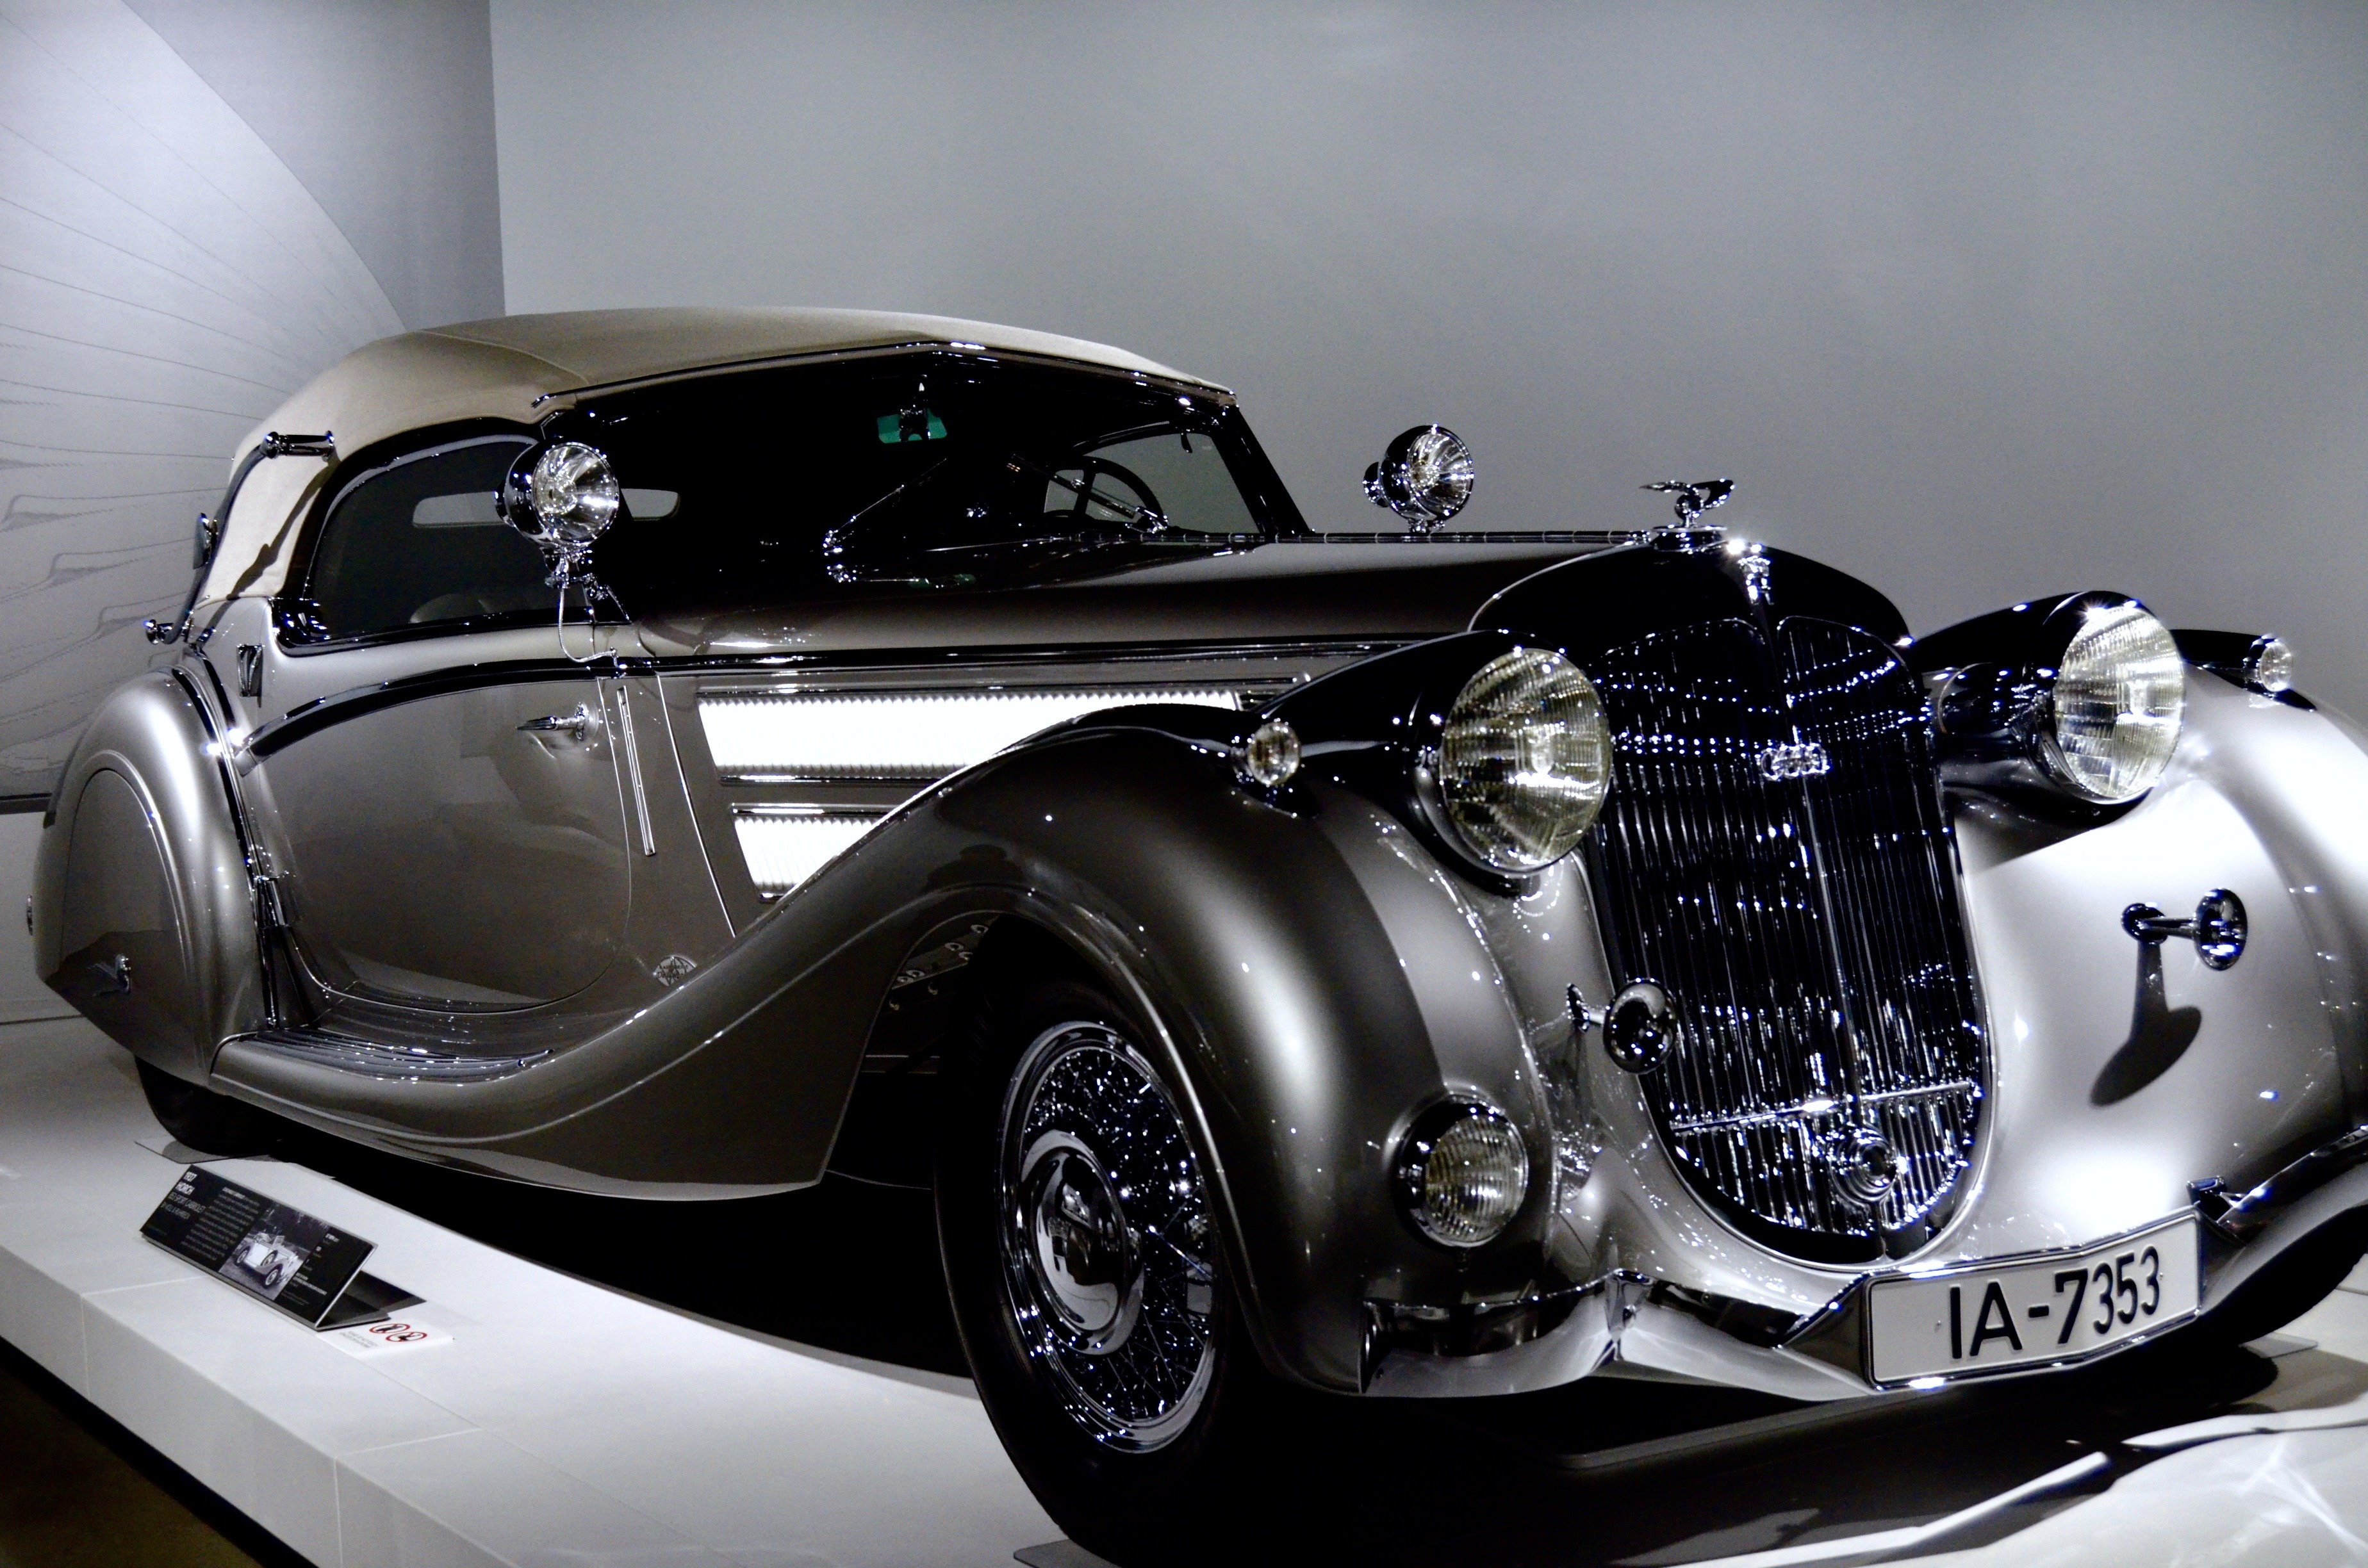 Watch Stars Of The Pertersen Automotive Museum video